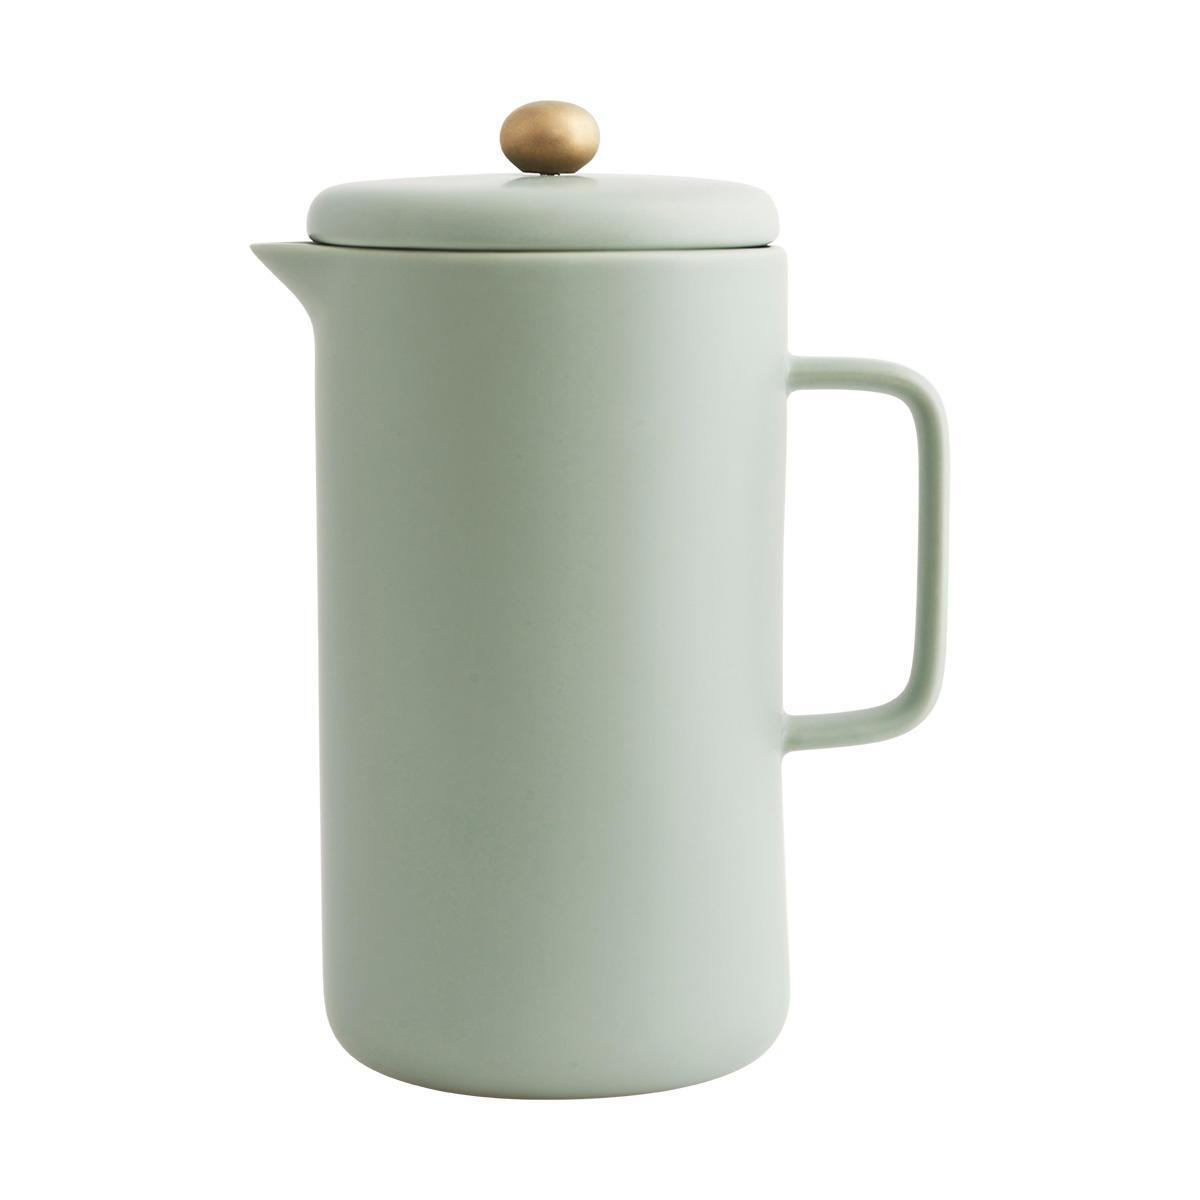 House Doctor Ruční presovač na kávu POT, zelená barva, šedá barva, kov, porcelán